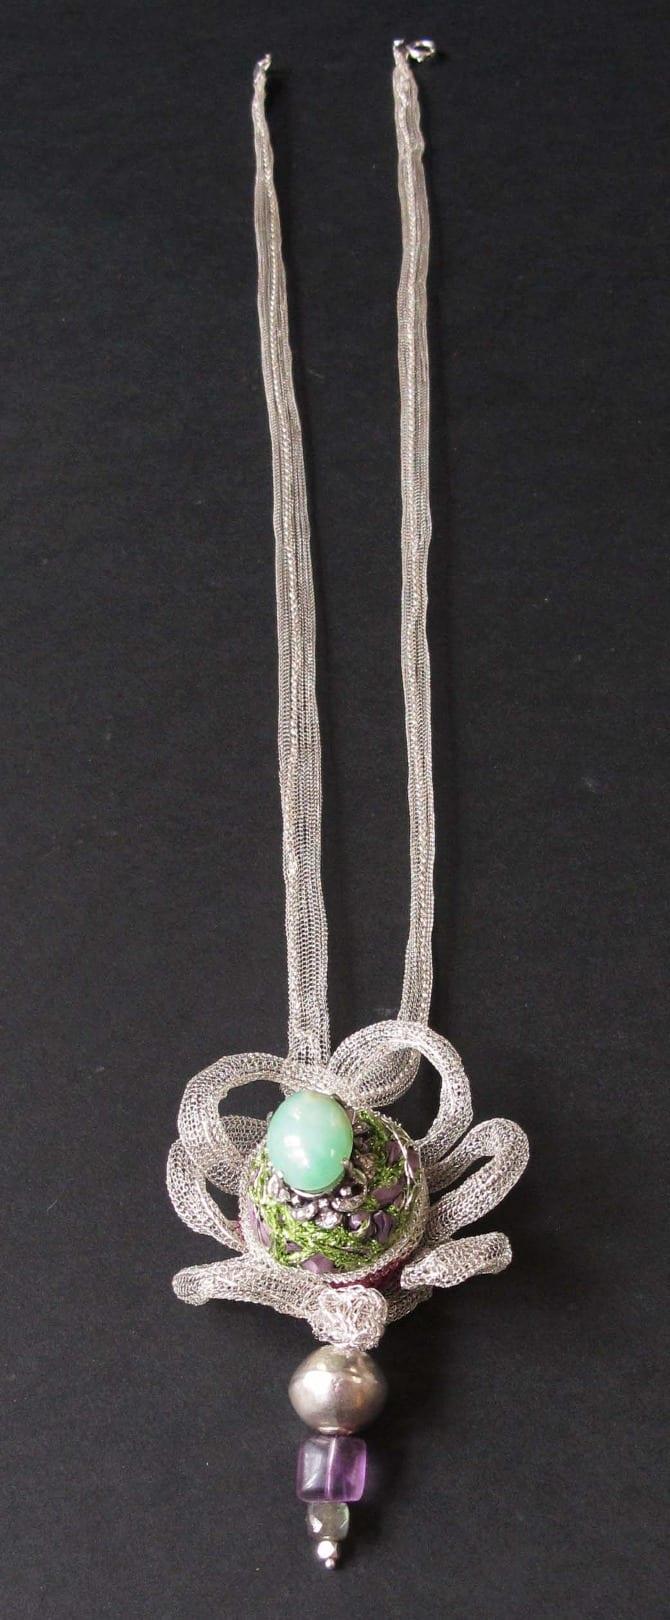 Sautoir intégrant une bague en jade